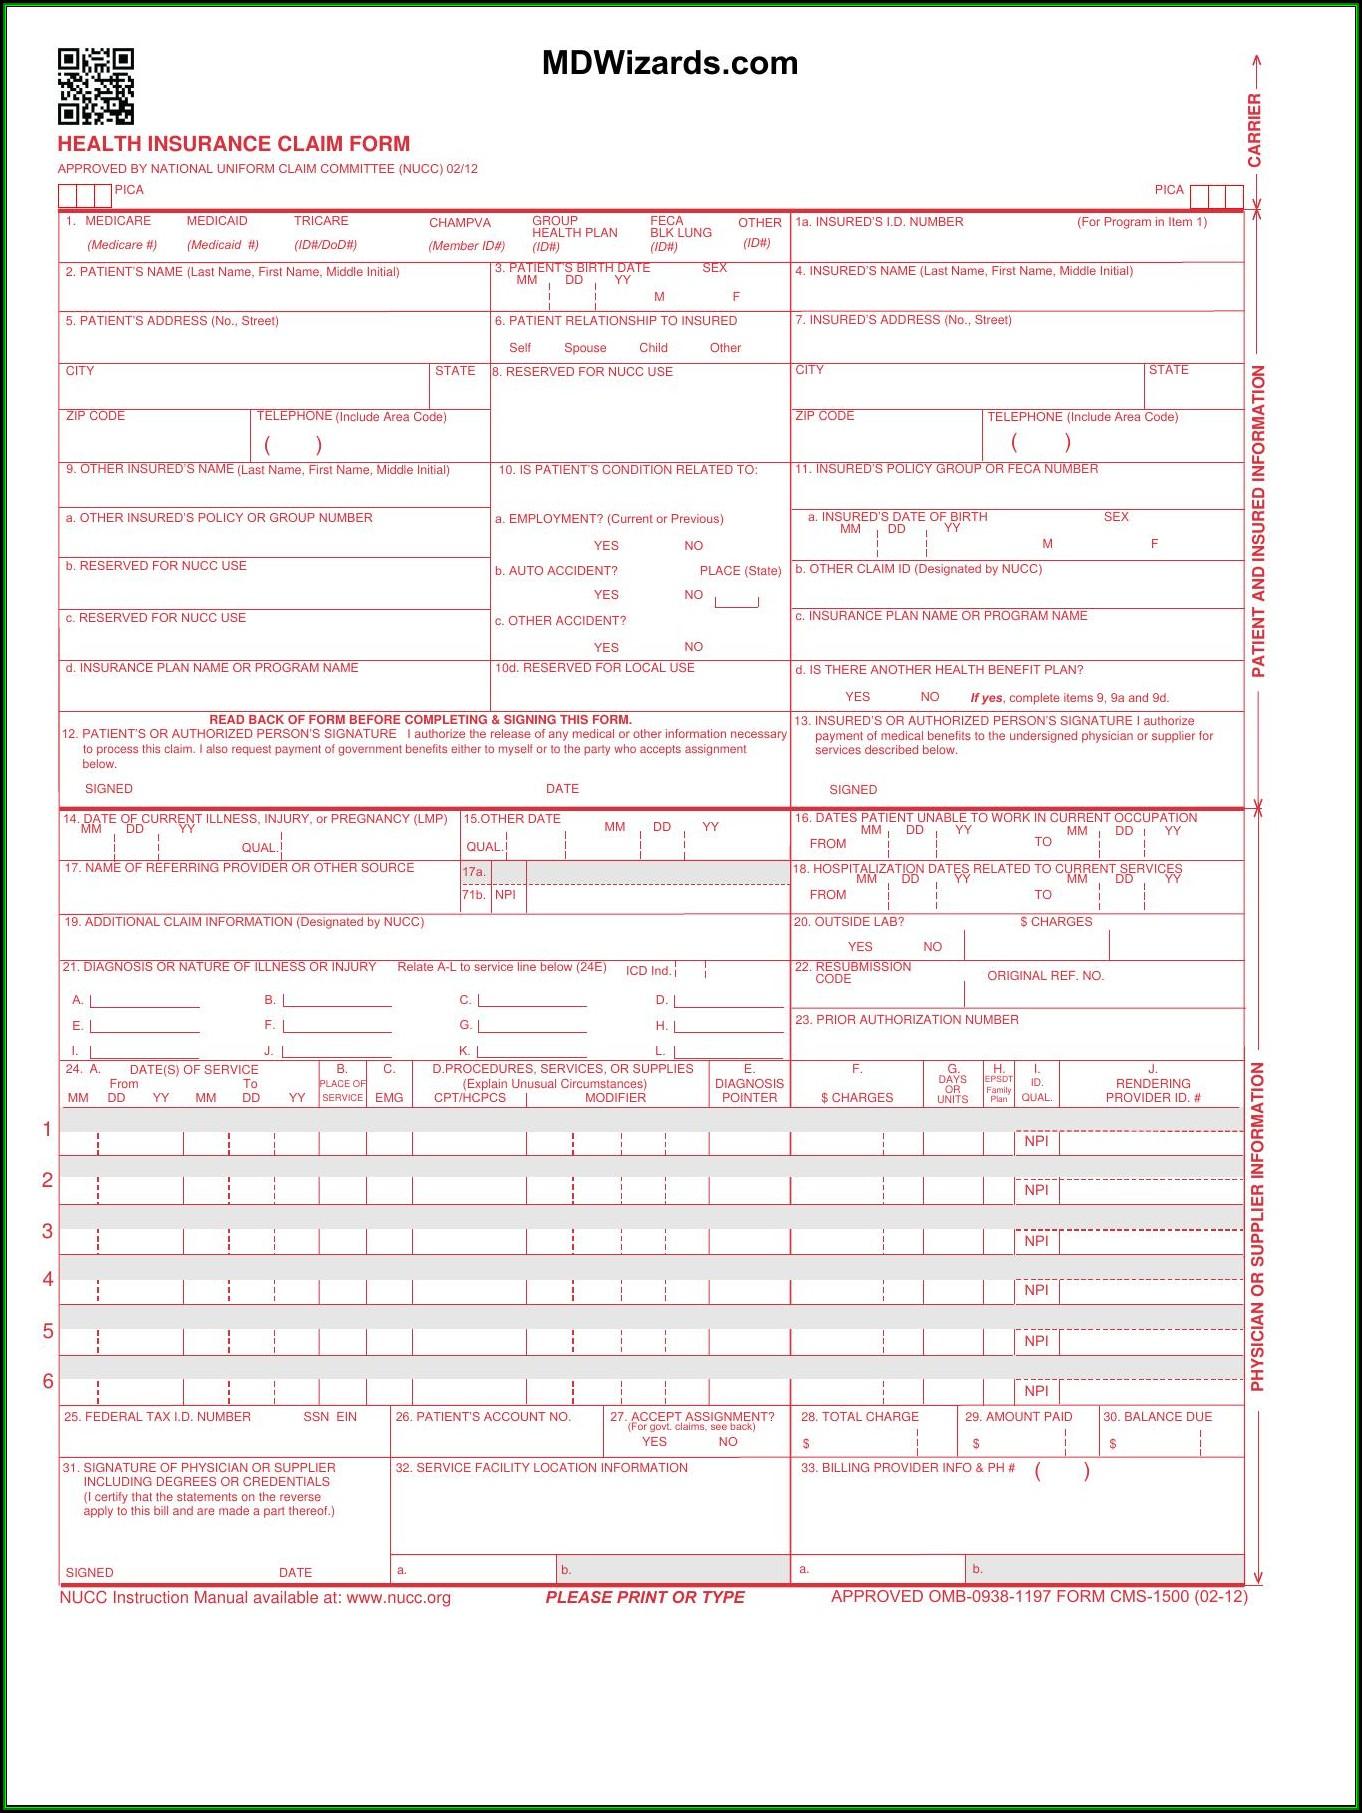 Hcfa 1500 Form Pdf Free